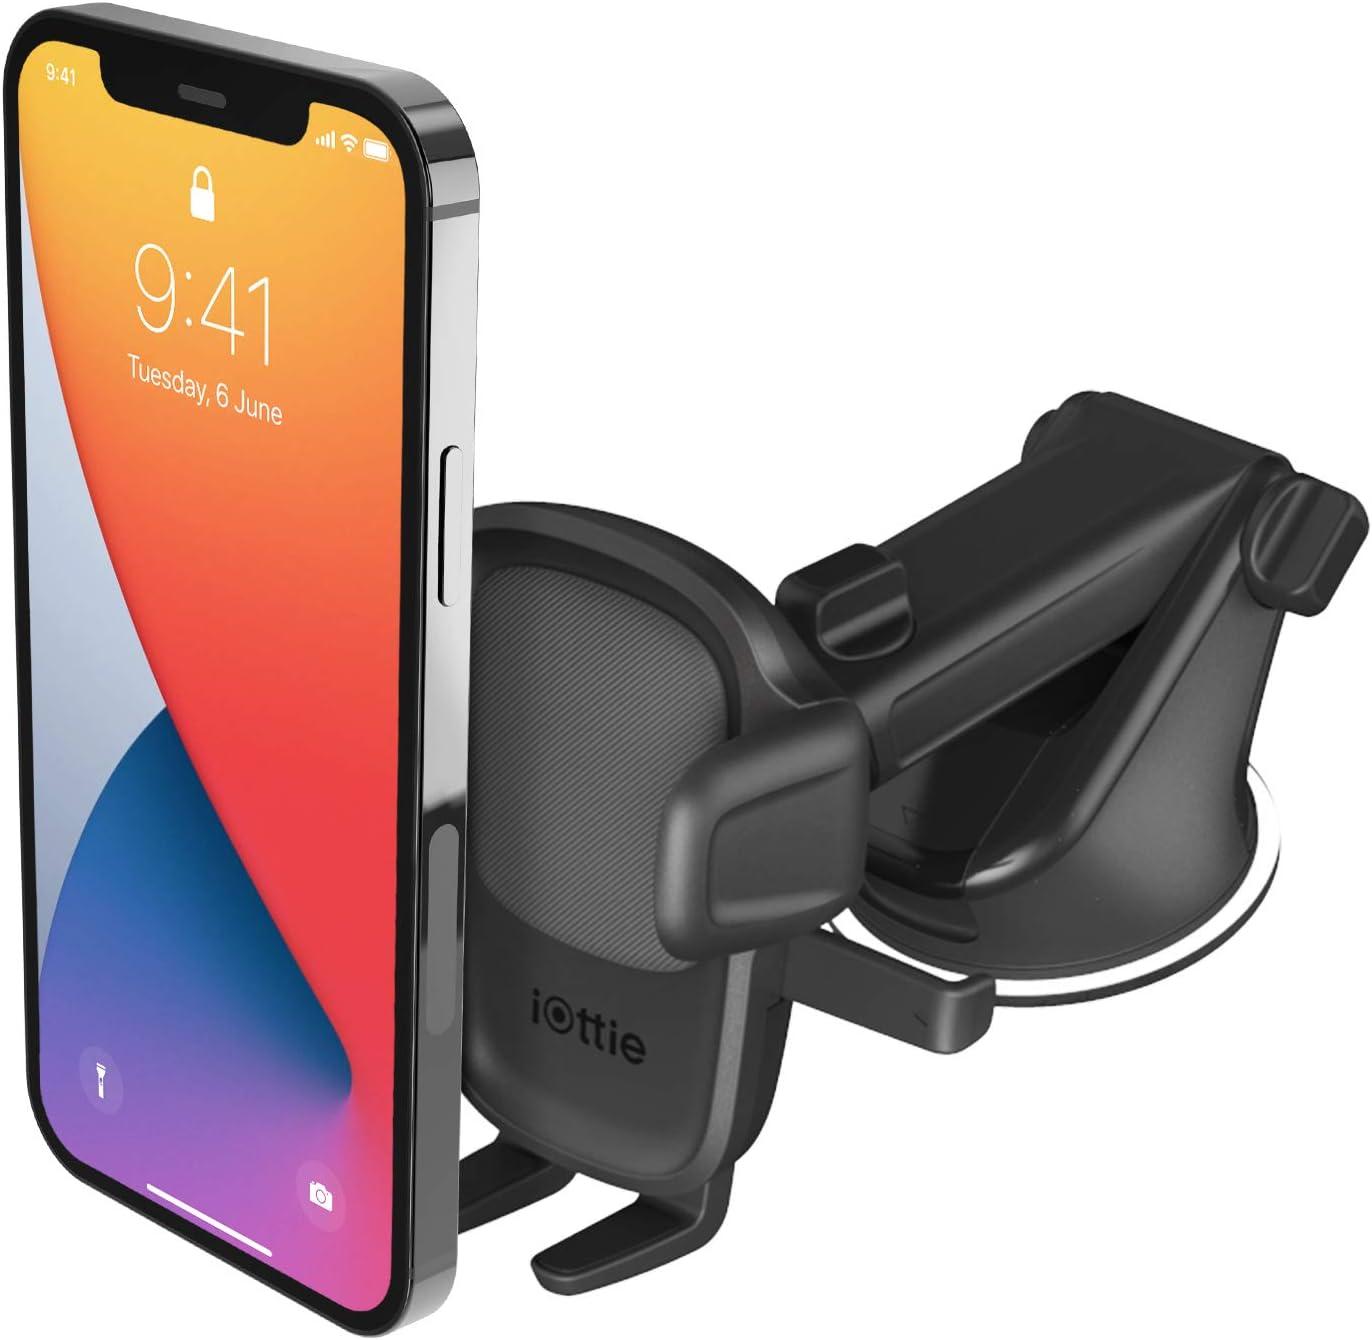 iOttie Mount Phone Holder Desk Stand $17.49 Coupon